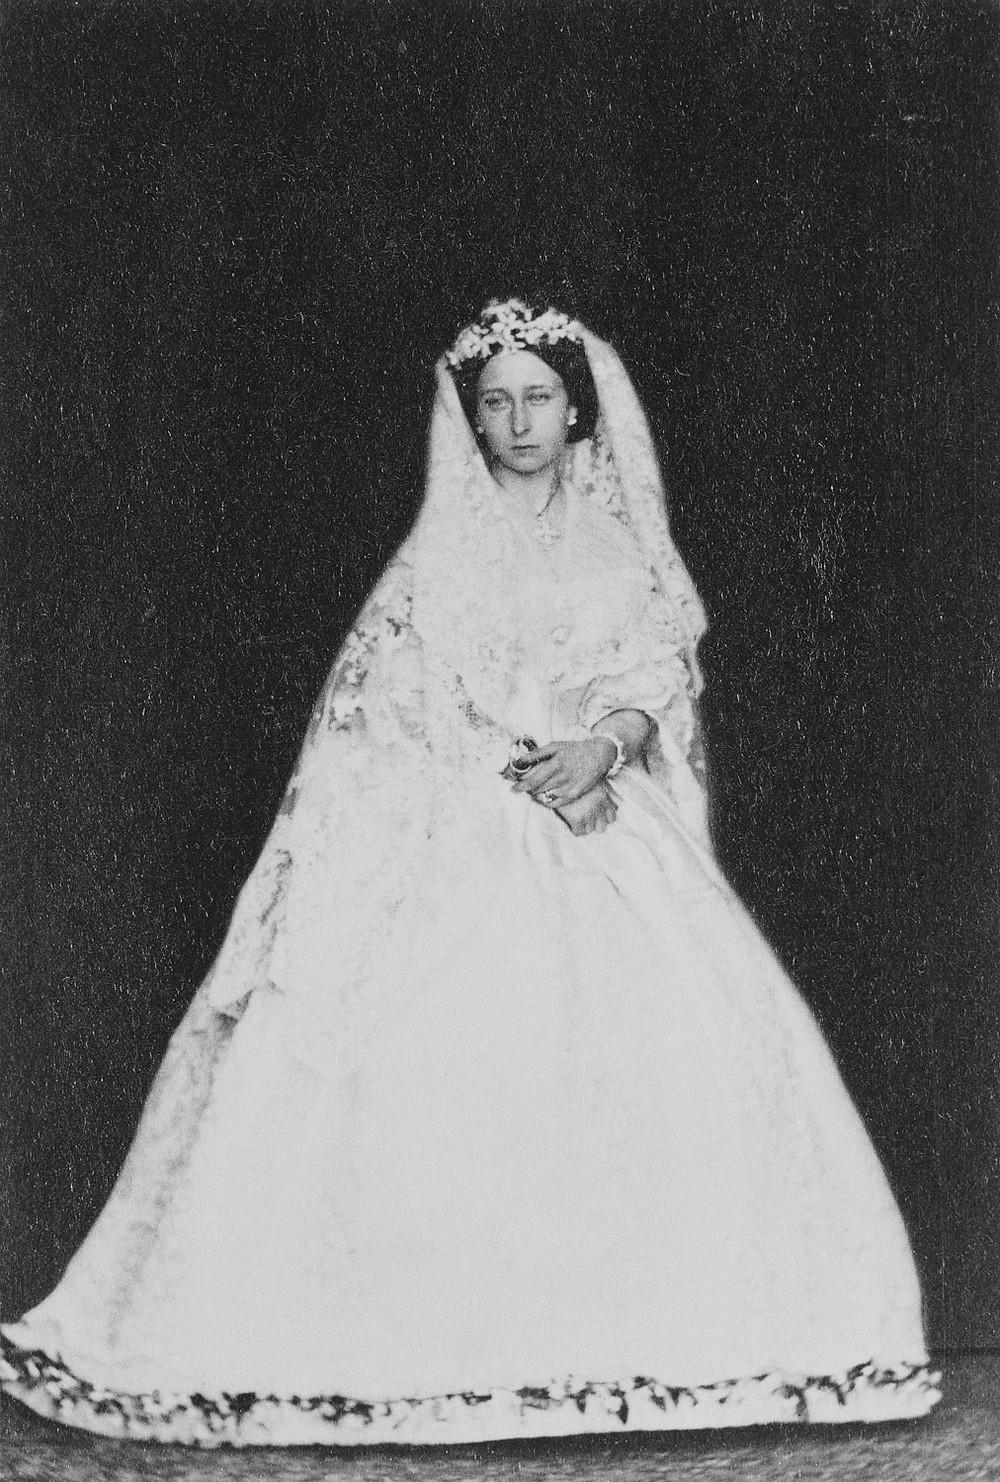 Princess Alice in her wedding dress Jul 1862. By WILLIAM BAMBRIDGE. Royal Collection Trust/© Her Majesty Queen Elizabeth II 2020